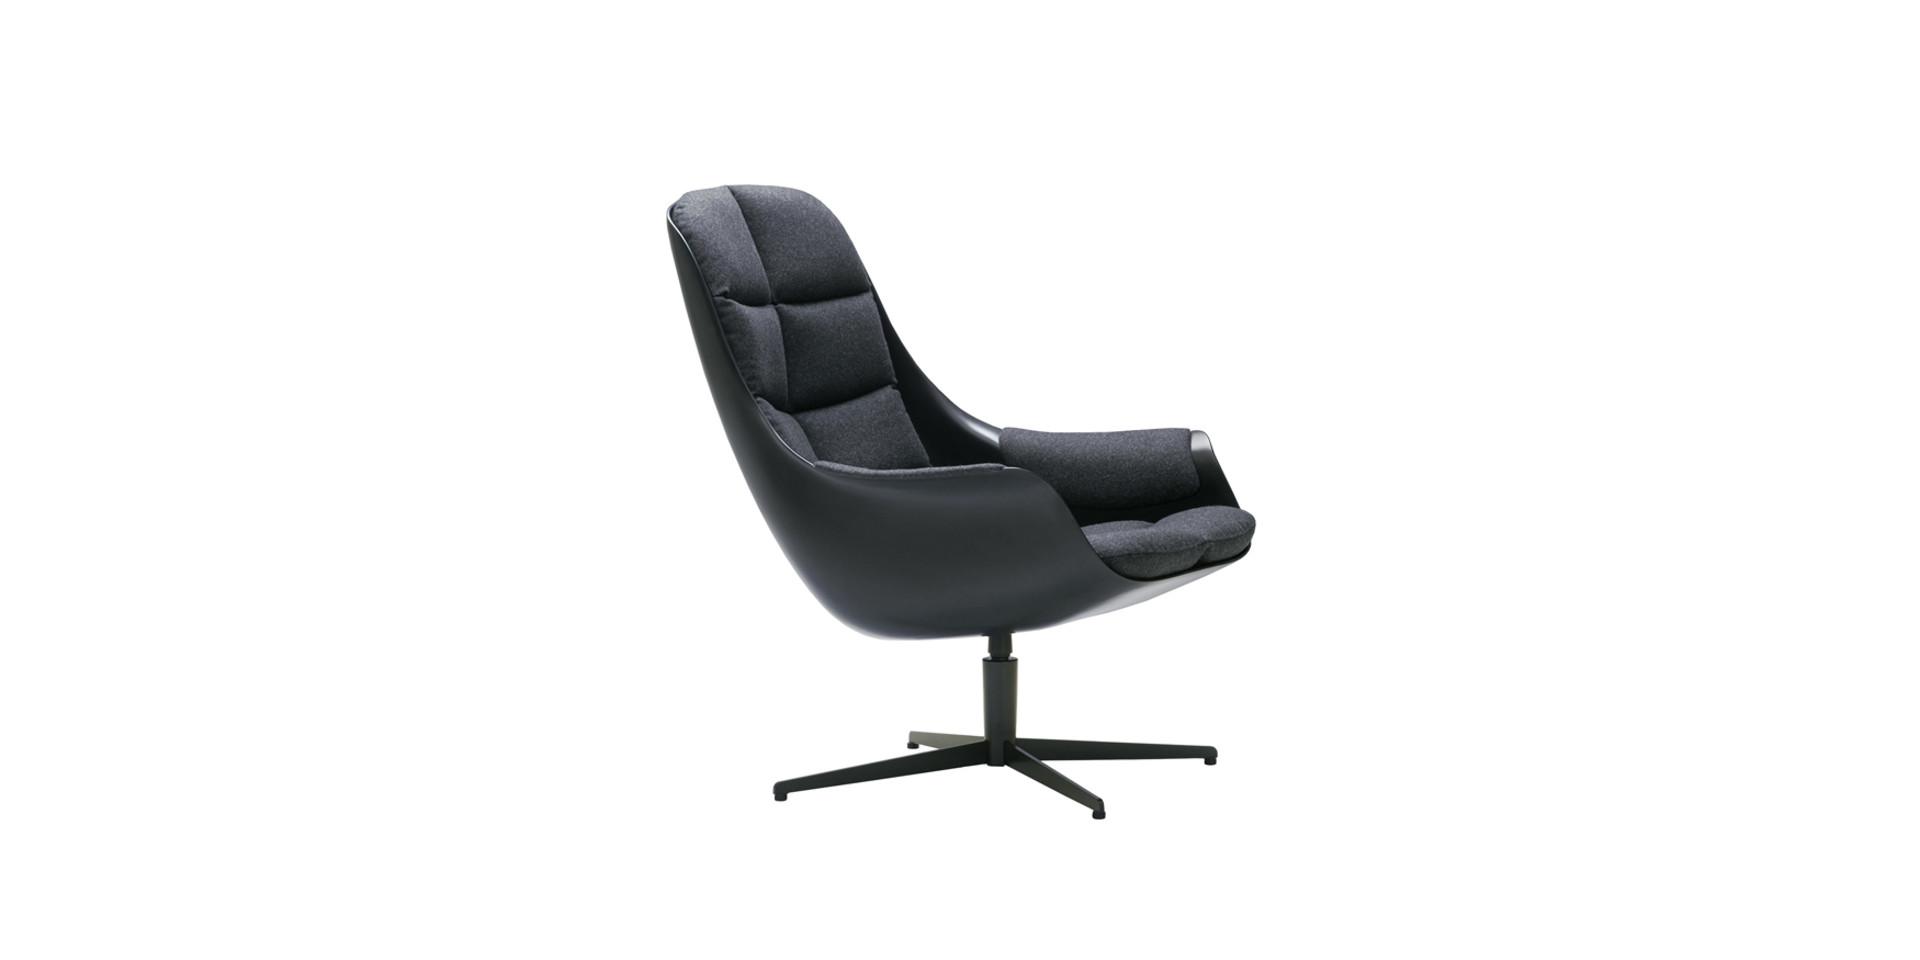 MYBIRD_armchair_swivel_white_panno_charcoal